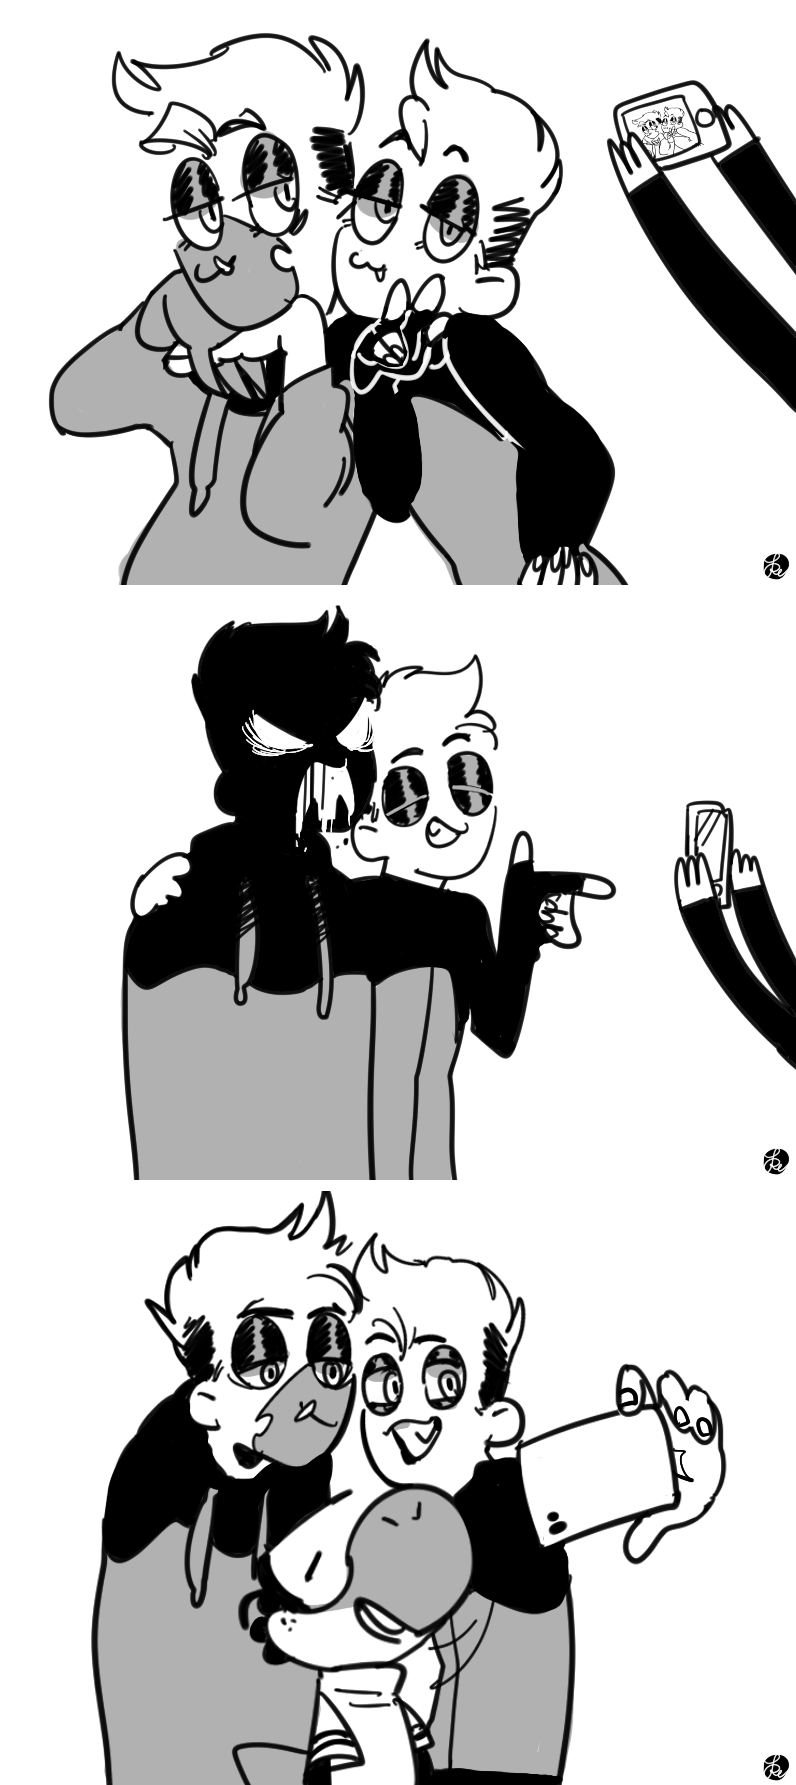 selfie2 by Tinypop